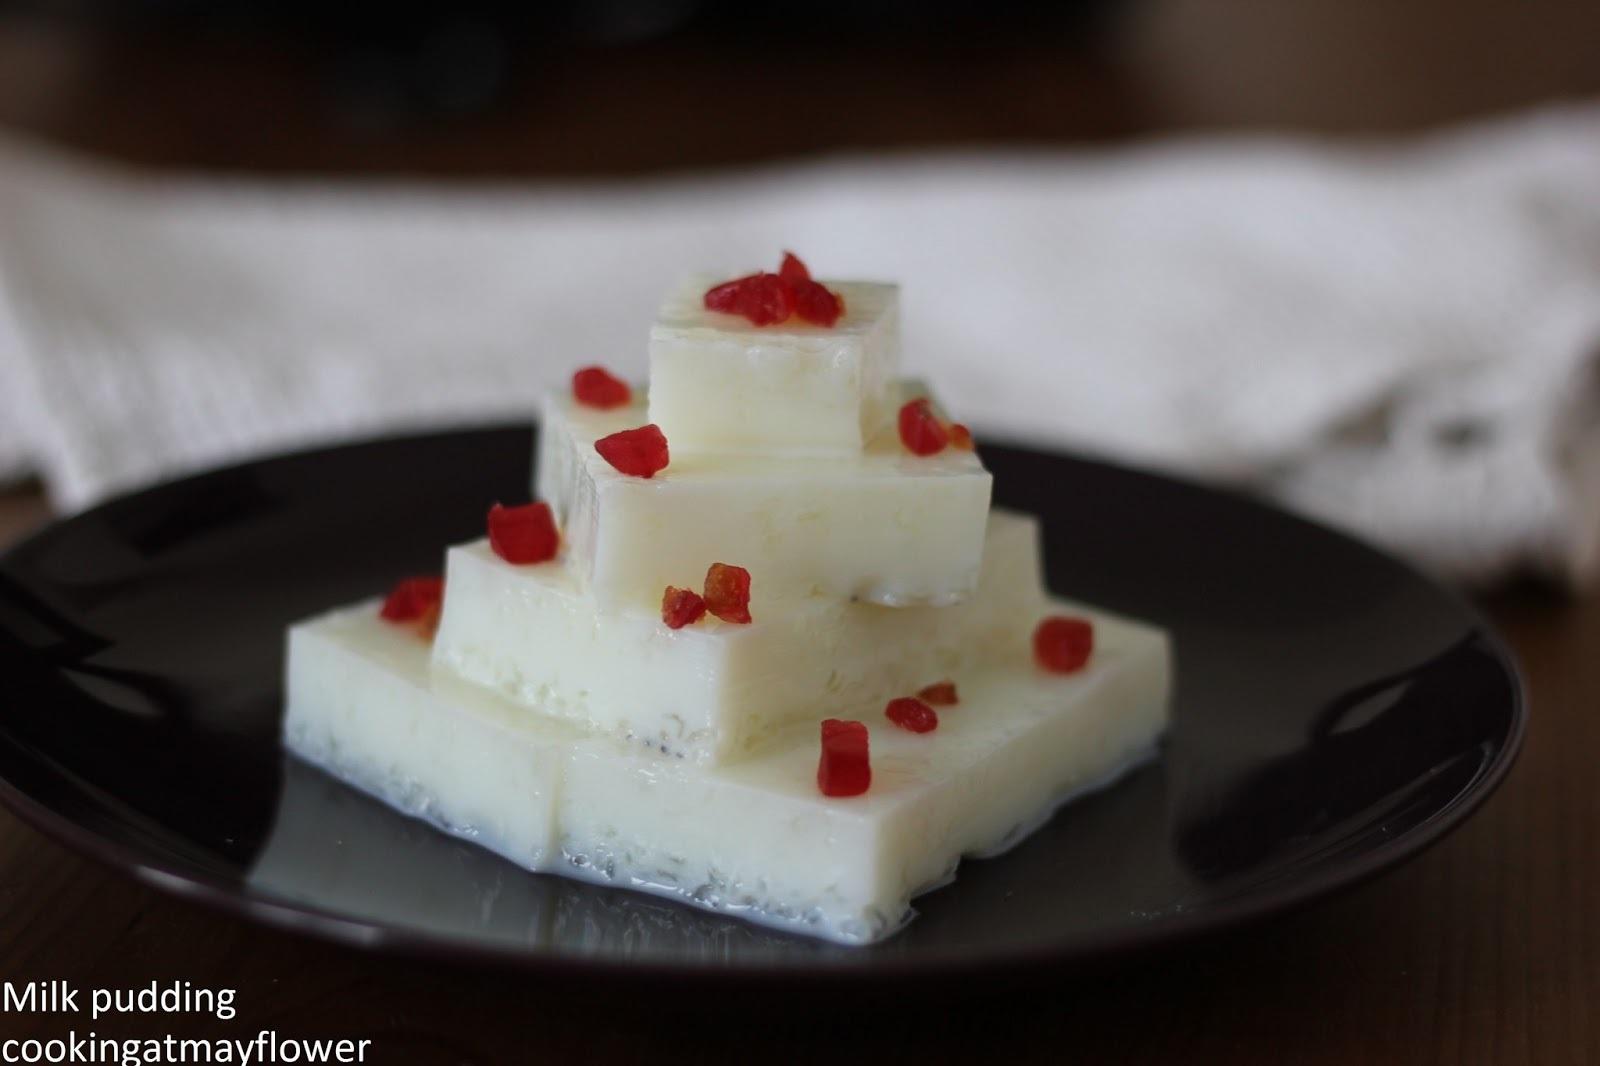 Simple milk pudding (China Grass pudding) (Agar Agar pudding)